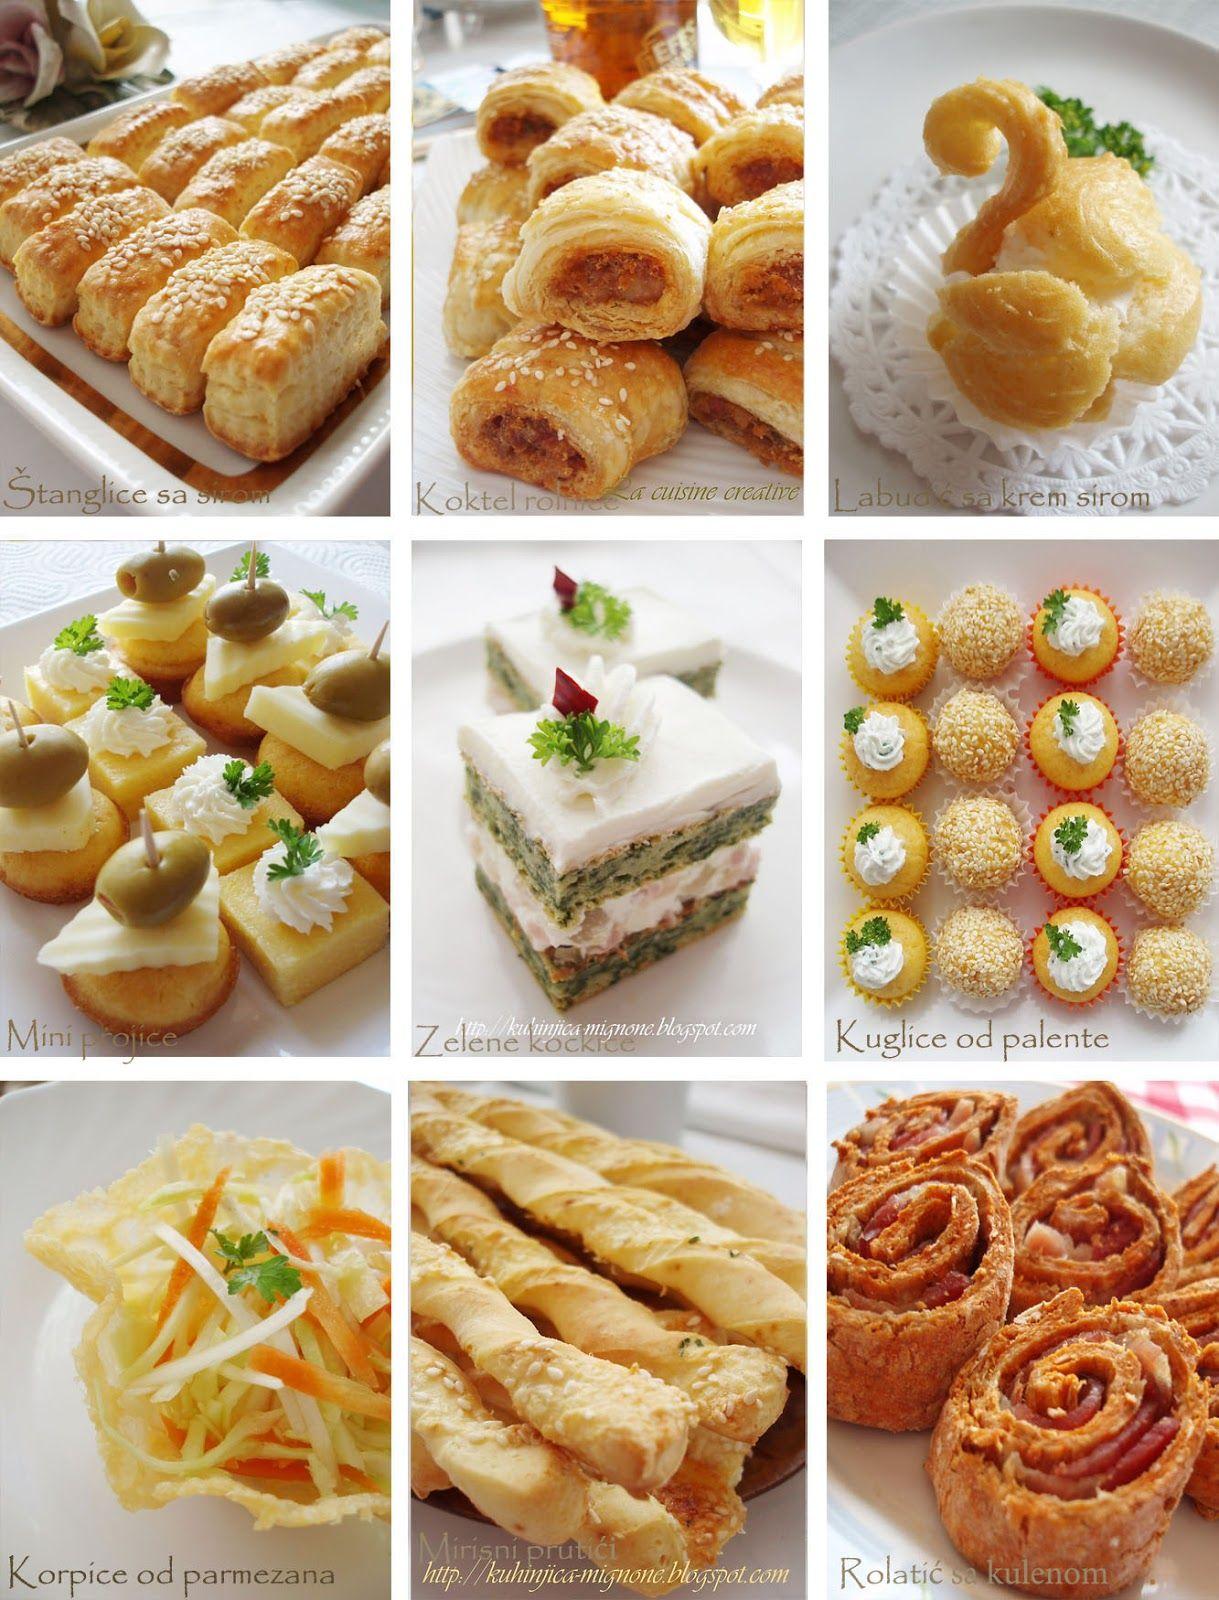 la cuisine creative: da gricnemo nešto?:) | finger food